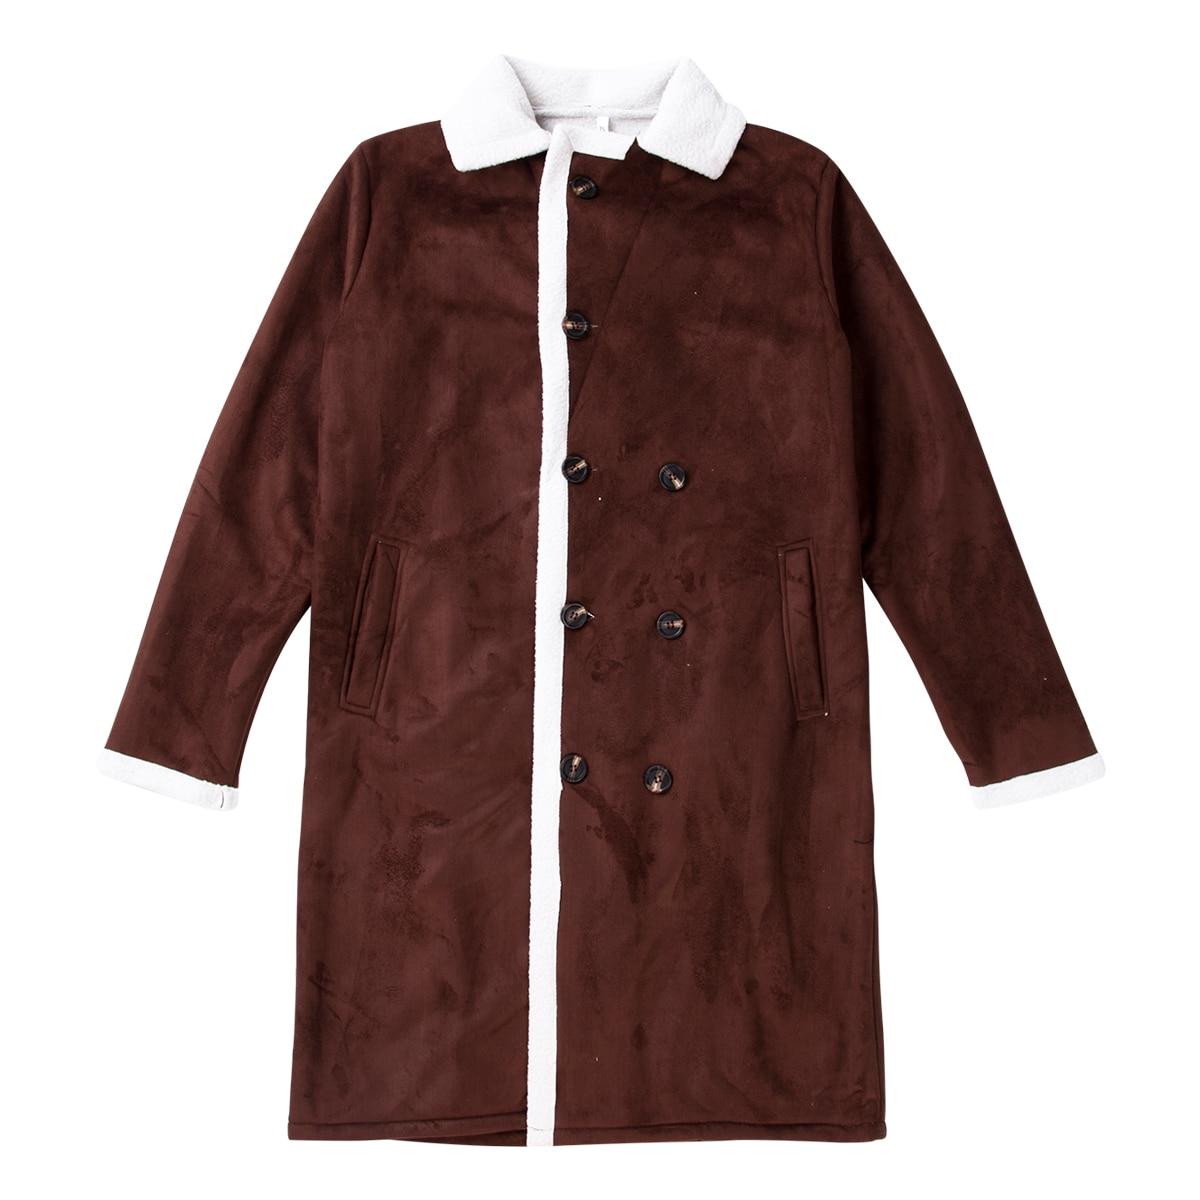 H96fca4574ce24521ae6b0aeee9945ccep Men's Winter Warm Trench Windproof Fur Fleece Long Coat Overcoat Lapel Warm Fluffy Jacket Buttons Outerwear Plus Size Coat